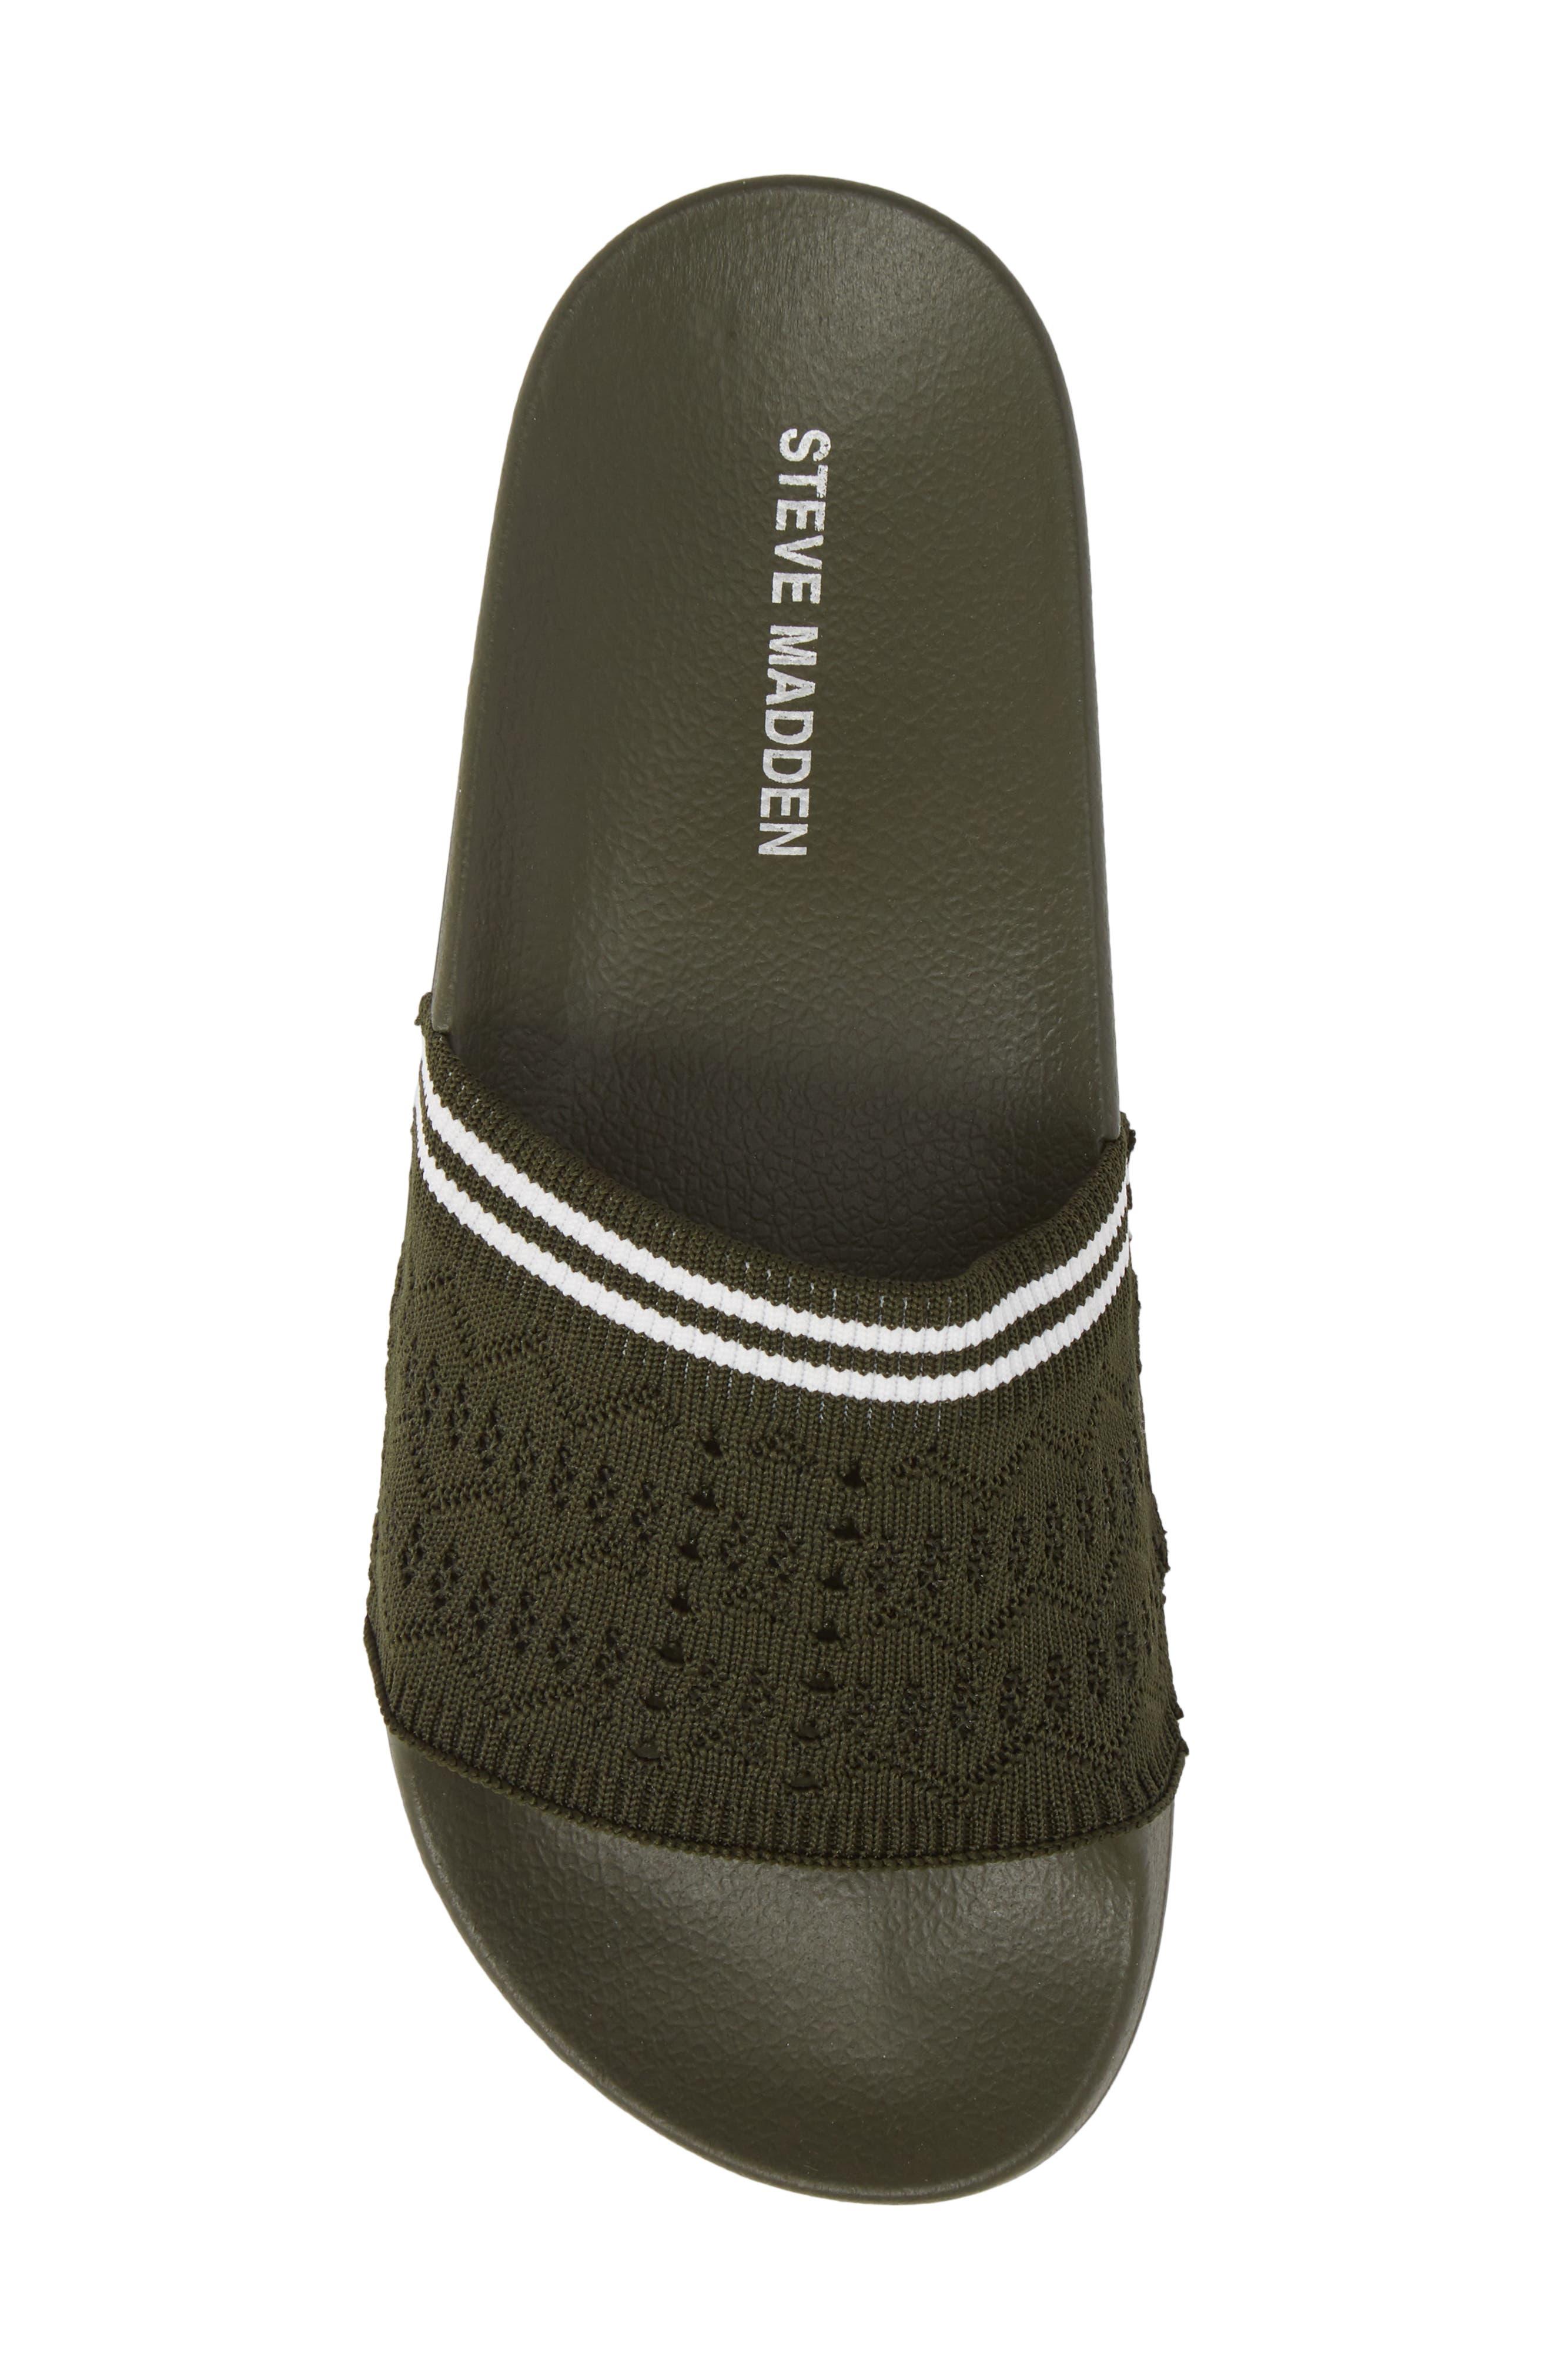 Vibe Sock Knit Slide Sandal,                             Alternate thumbnail 22, color,